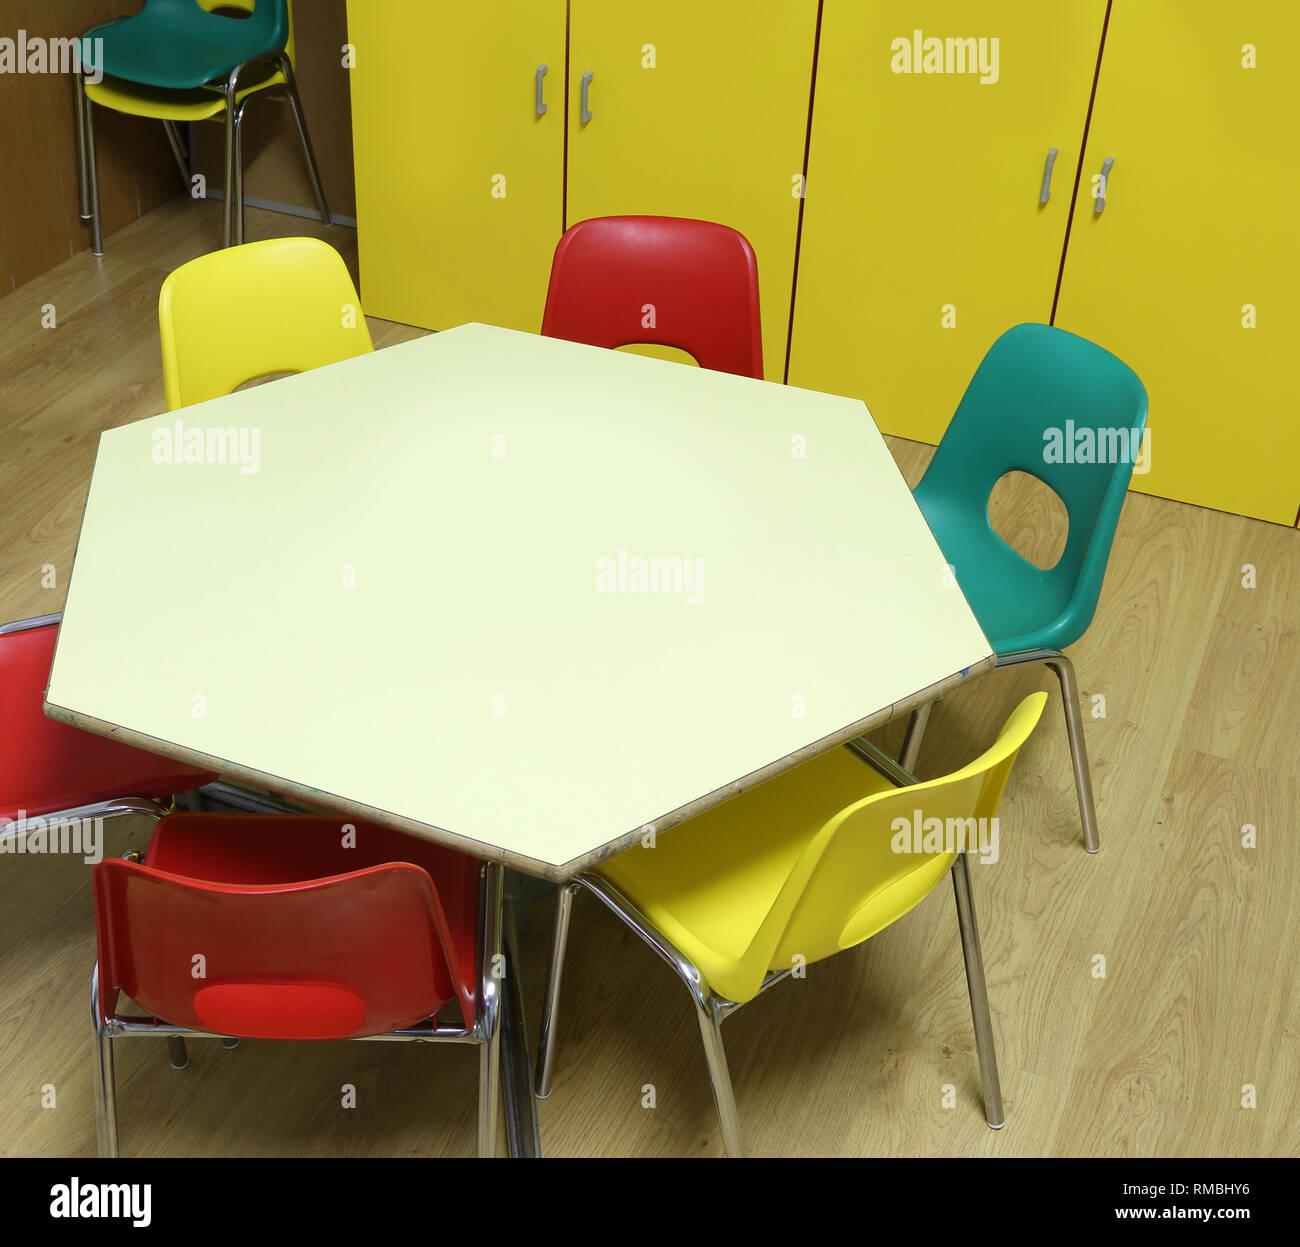 Wondrous Low Chairs And Hexagonal Table Of A Kindergarten Class Inzonedesignstudio Interior Chair Design Inzonedesignstudiocom